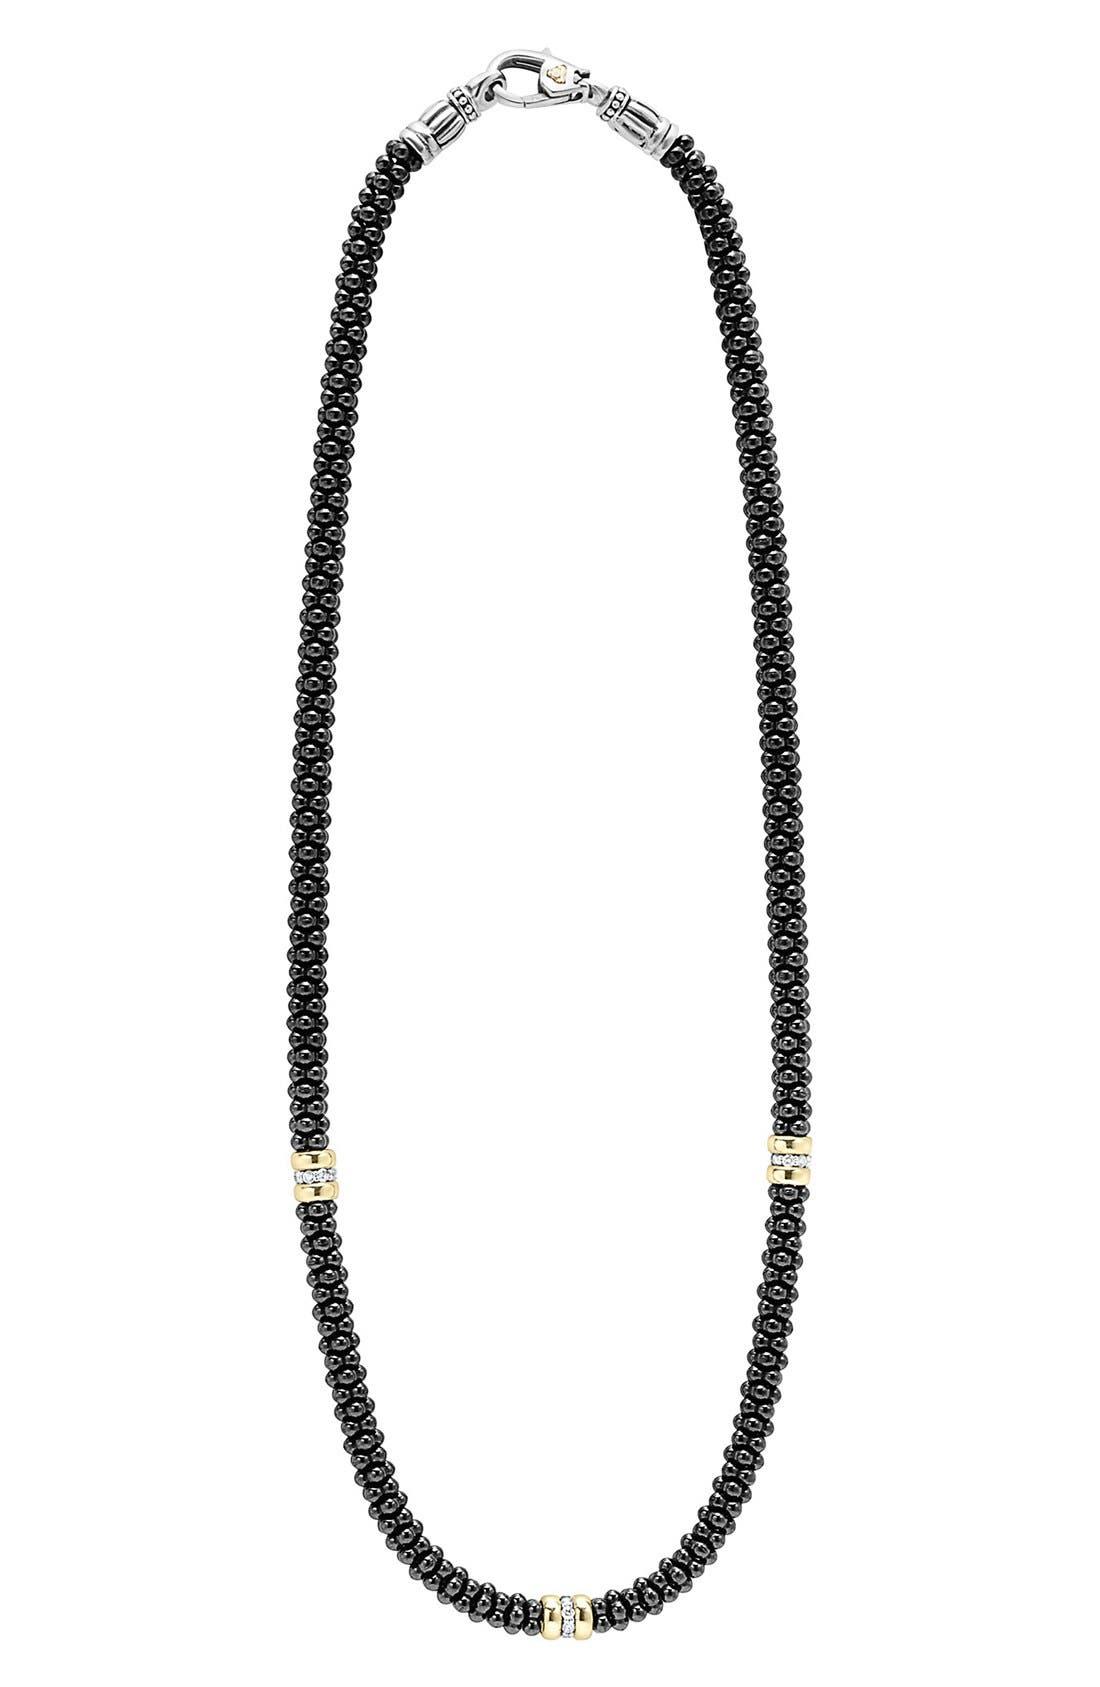 Main Image - LAGOS 'Black Caviar' Station Necklace